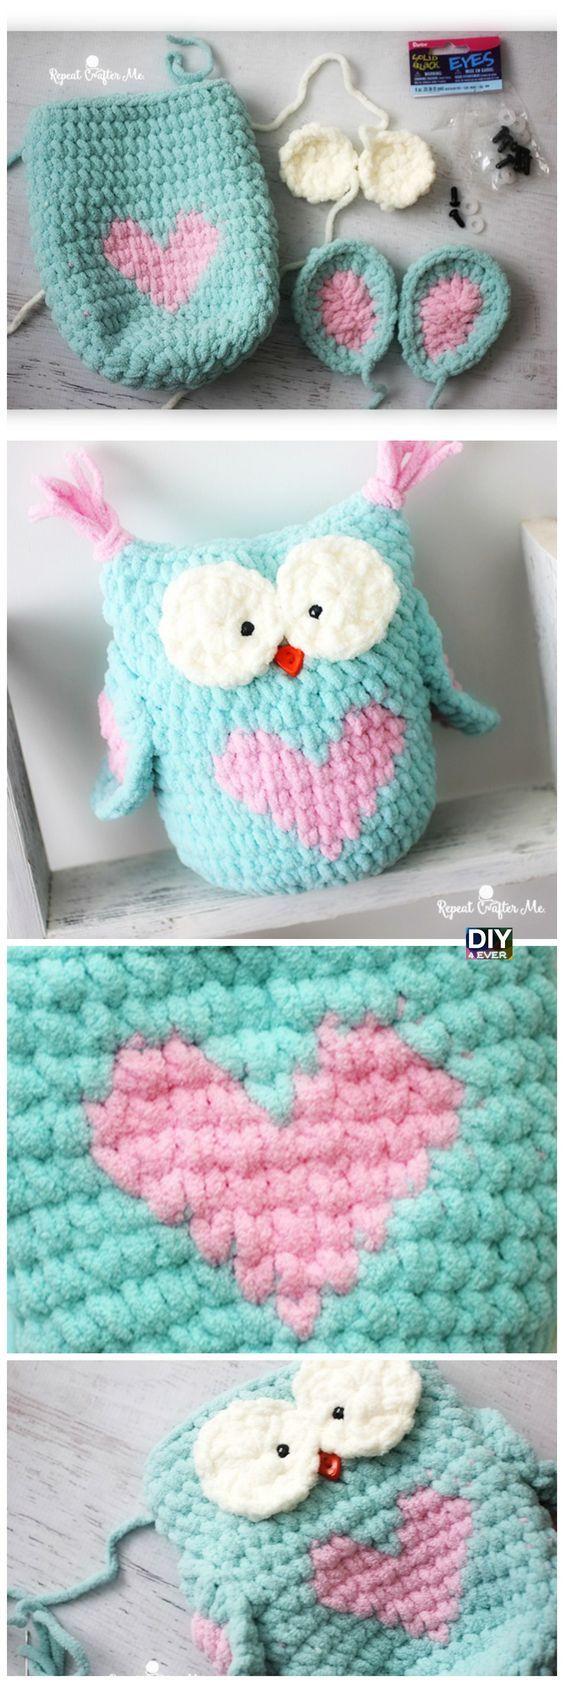 Valentine Heart Crochet Owl - Free Pattern | Pinterest | Häkeln ...